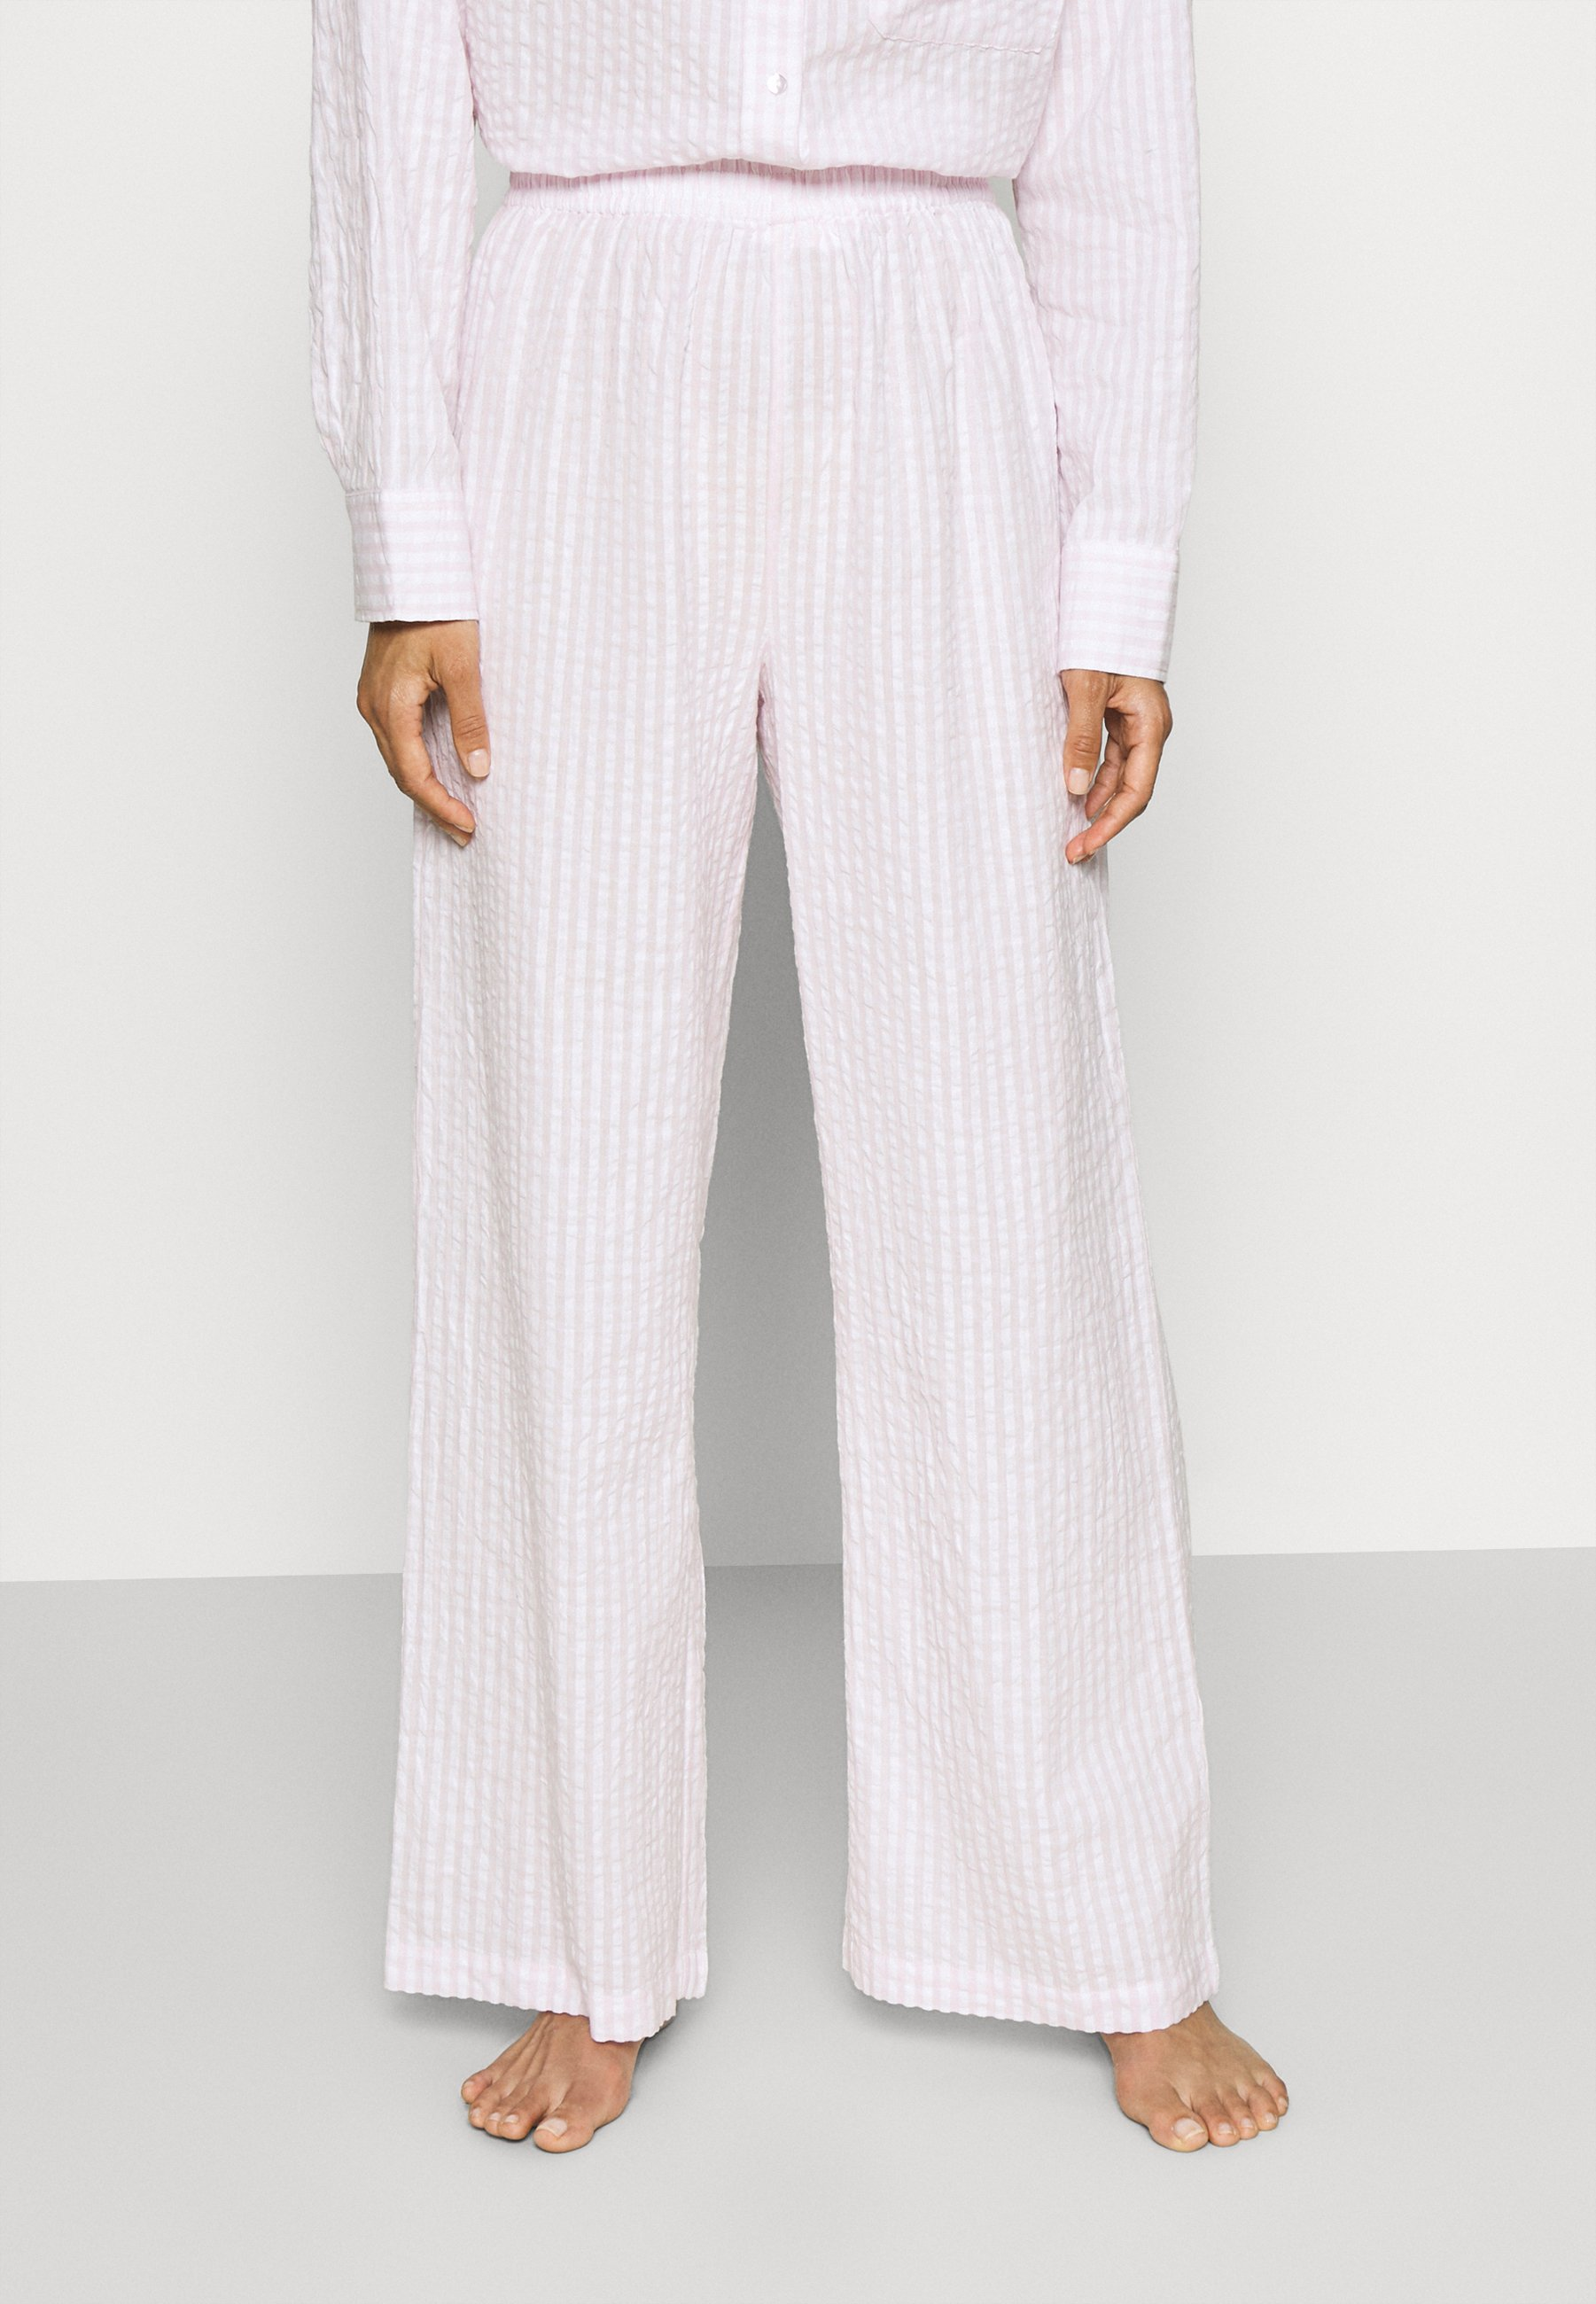 Donna LINA TROUSERS - Pantaloni del pigiama